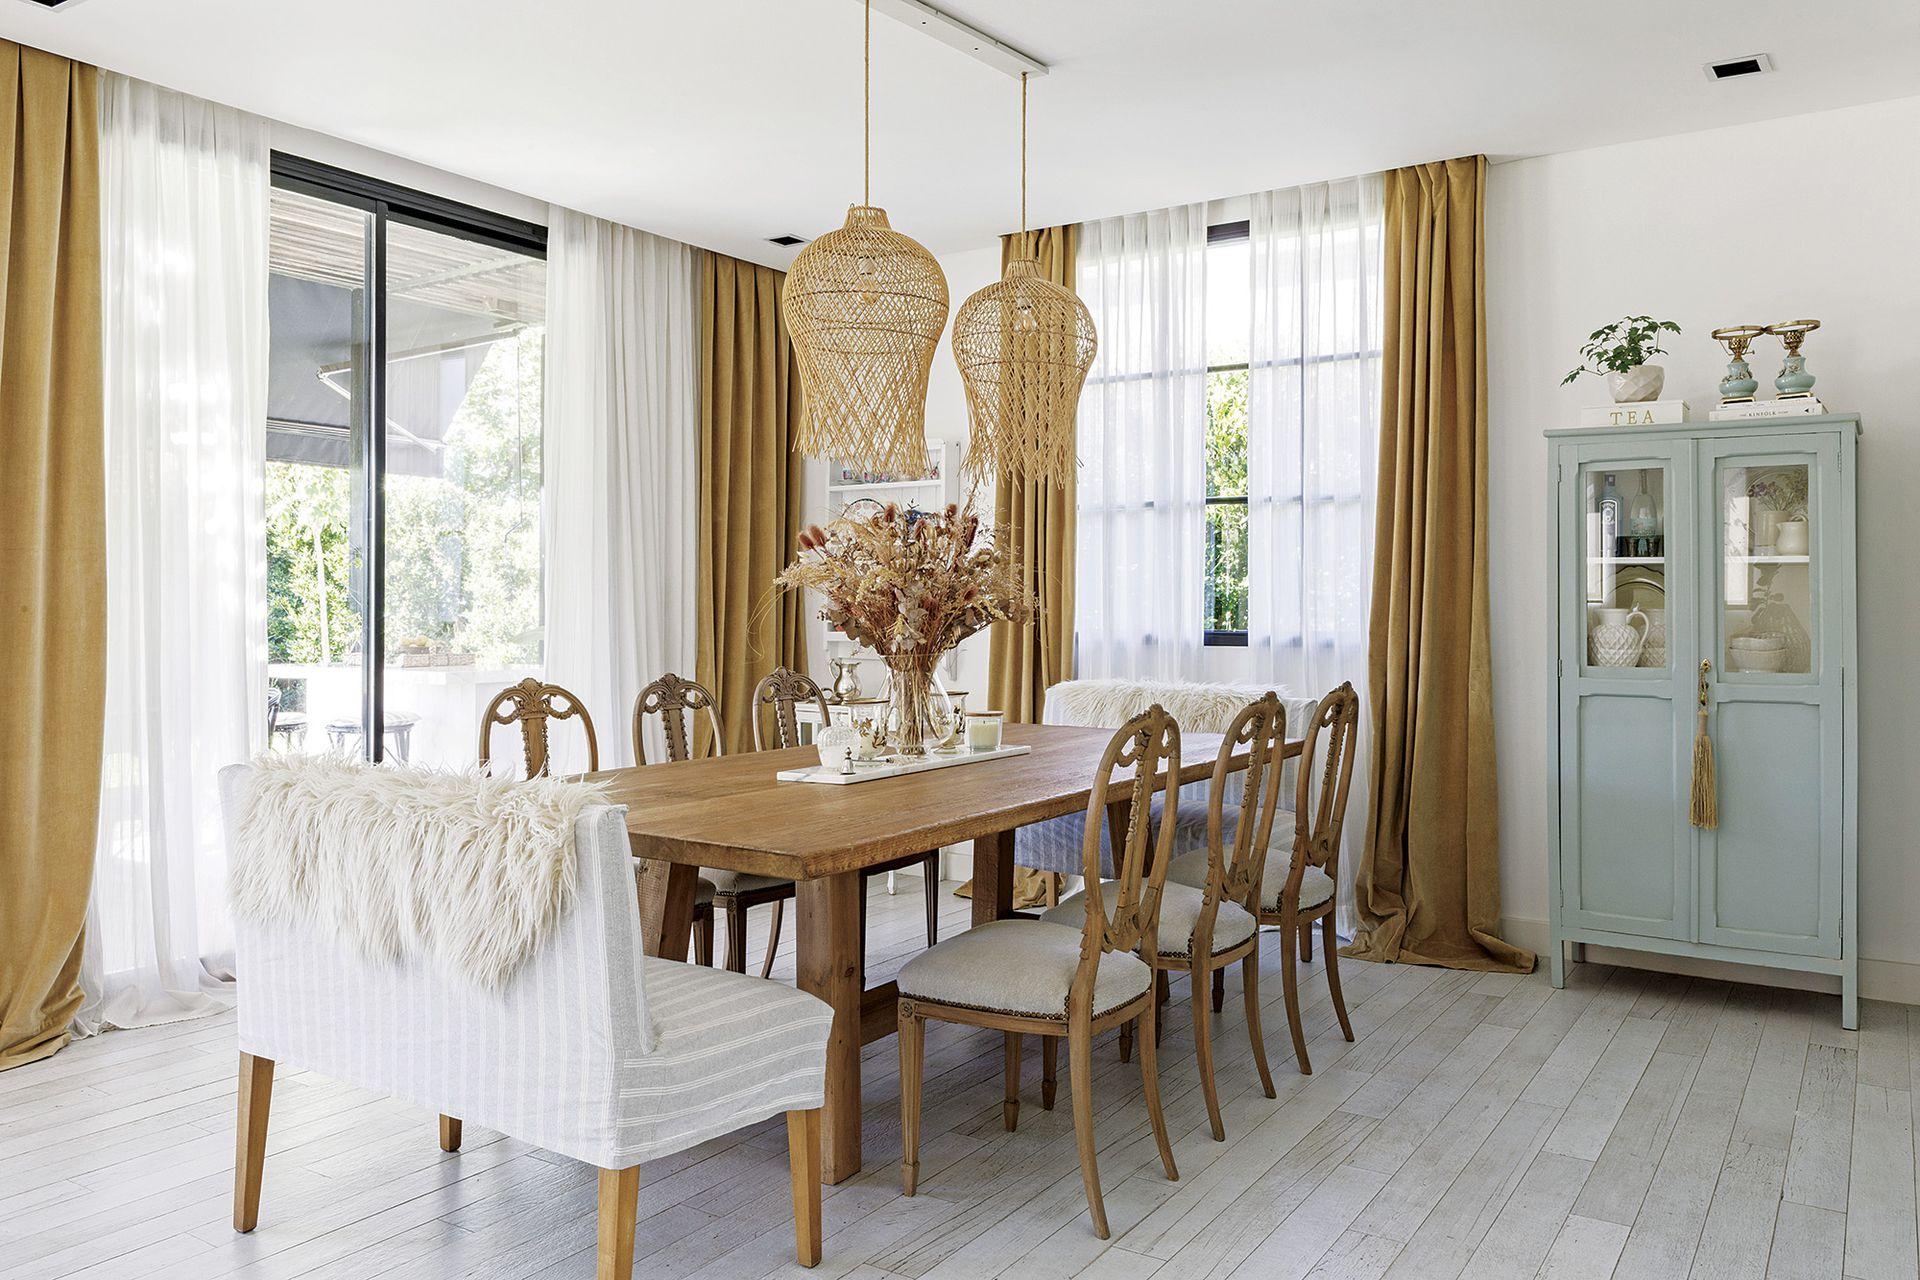 Las cortinas traslúcidas (Abax Deco) están enmarcadas por un cantonnier de terciopelo arena que parece dorado.